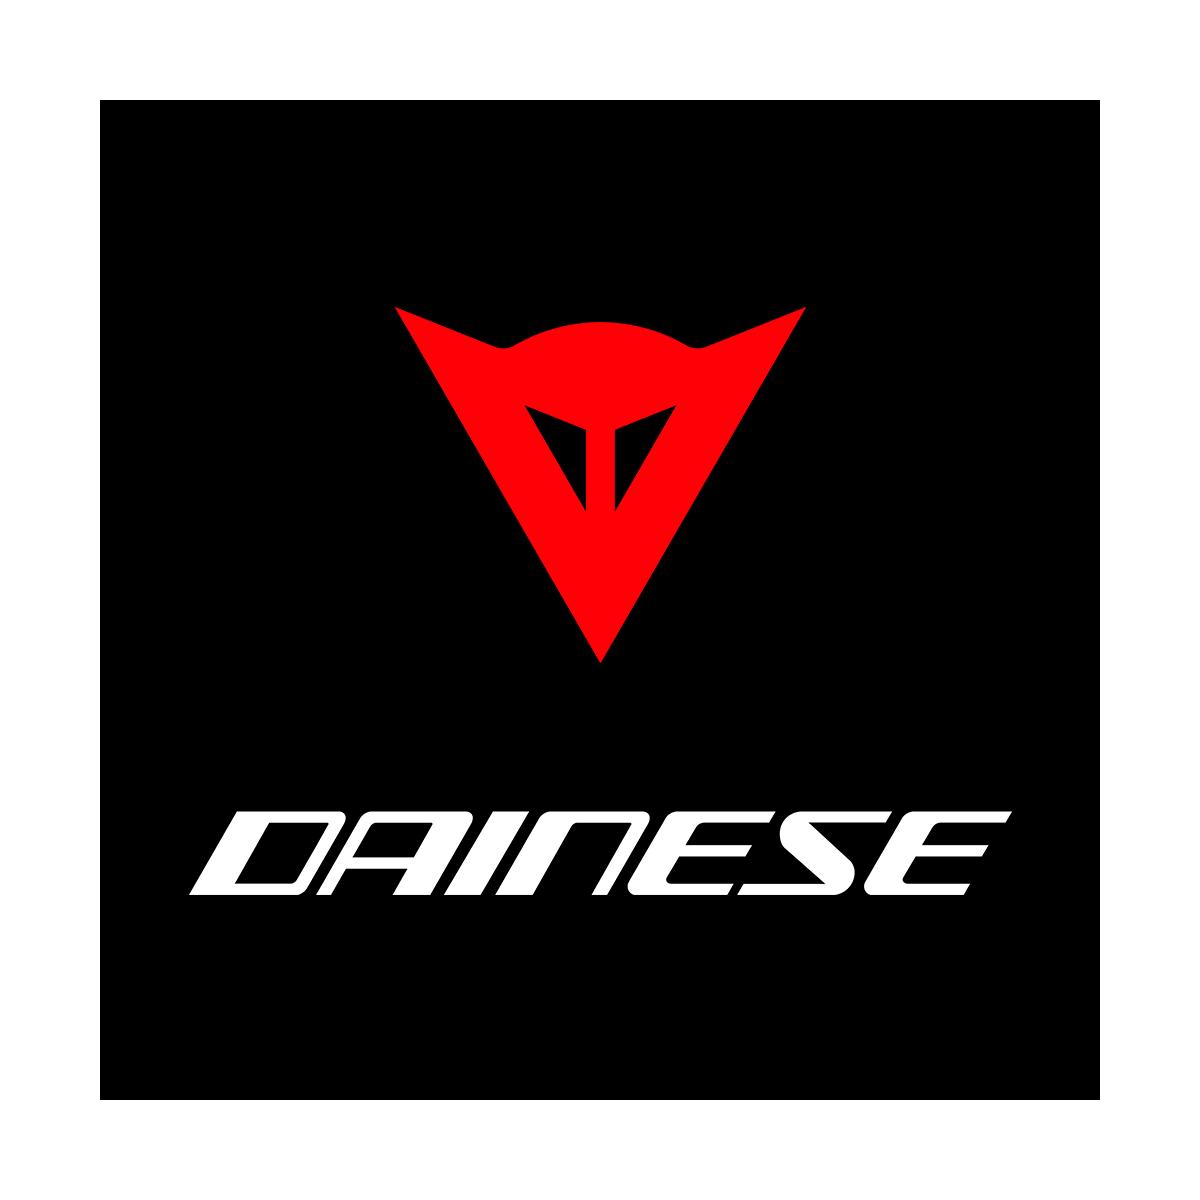 Dainese